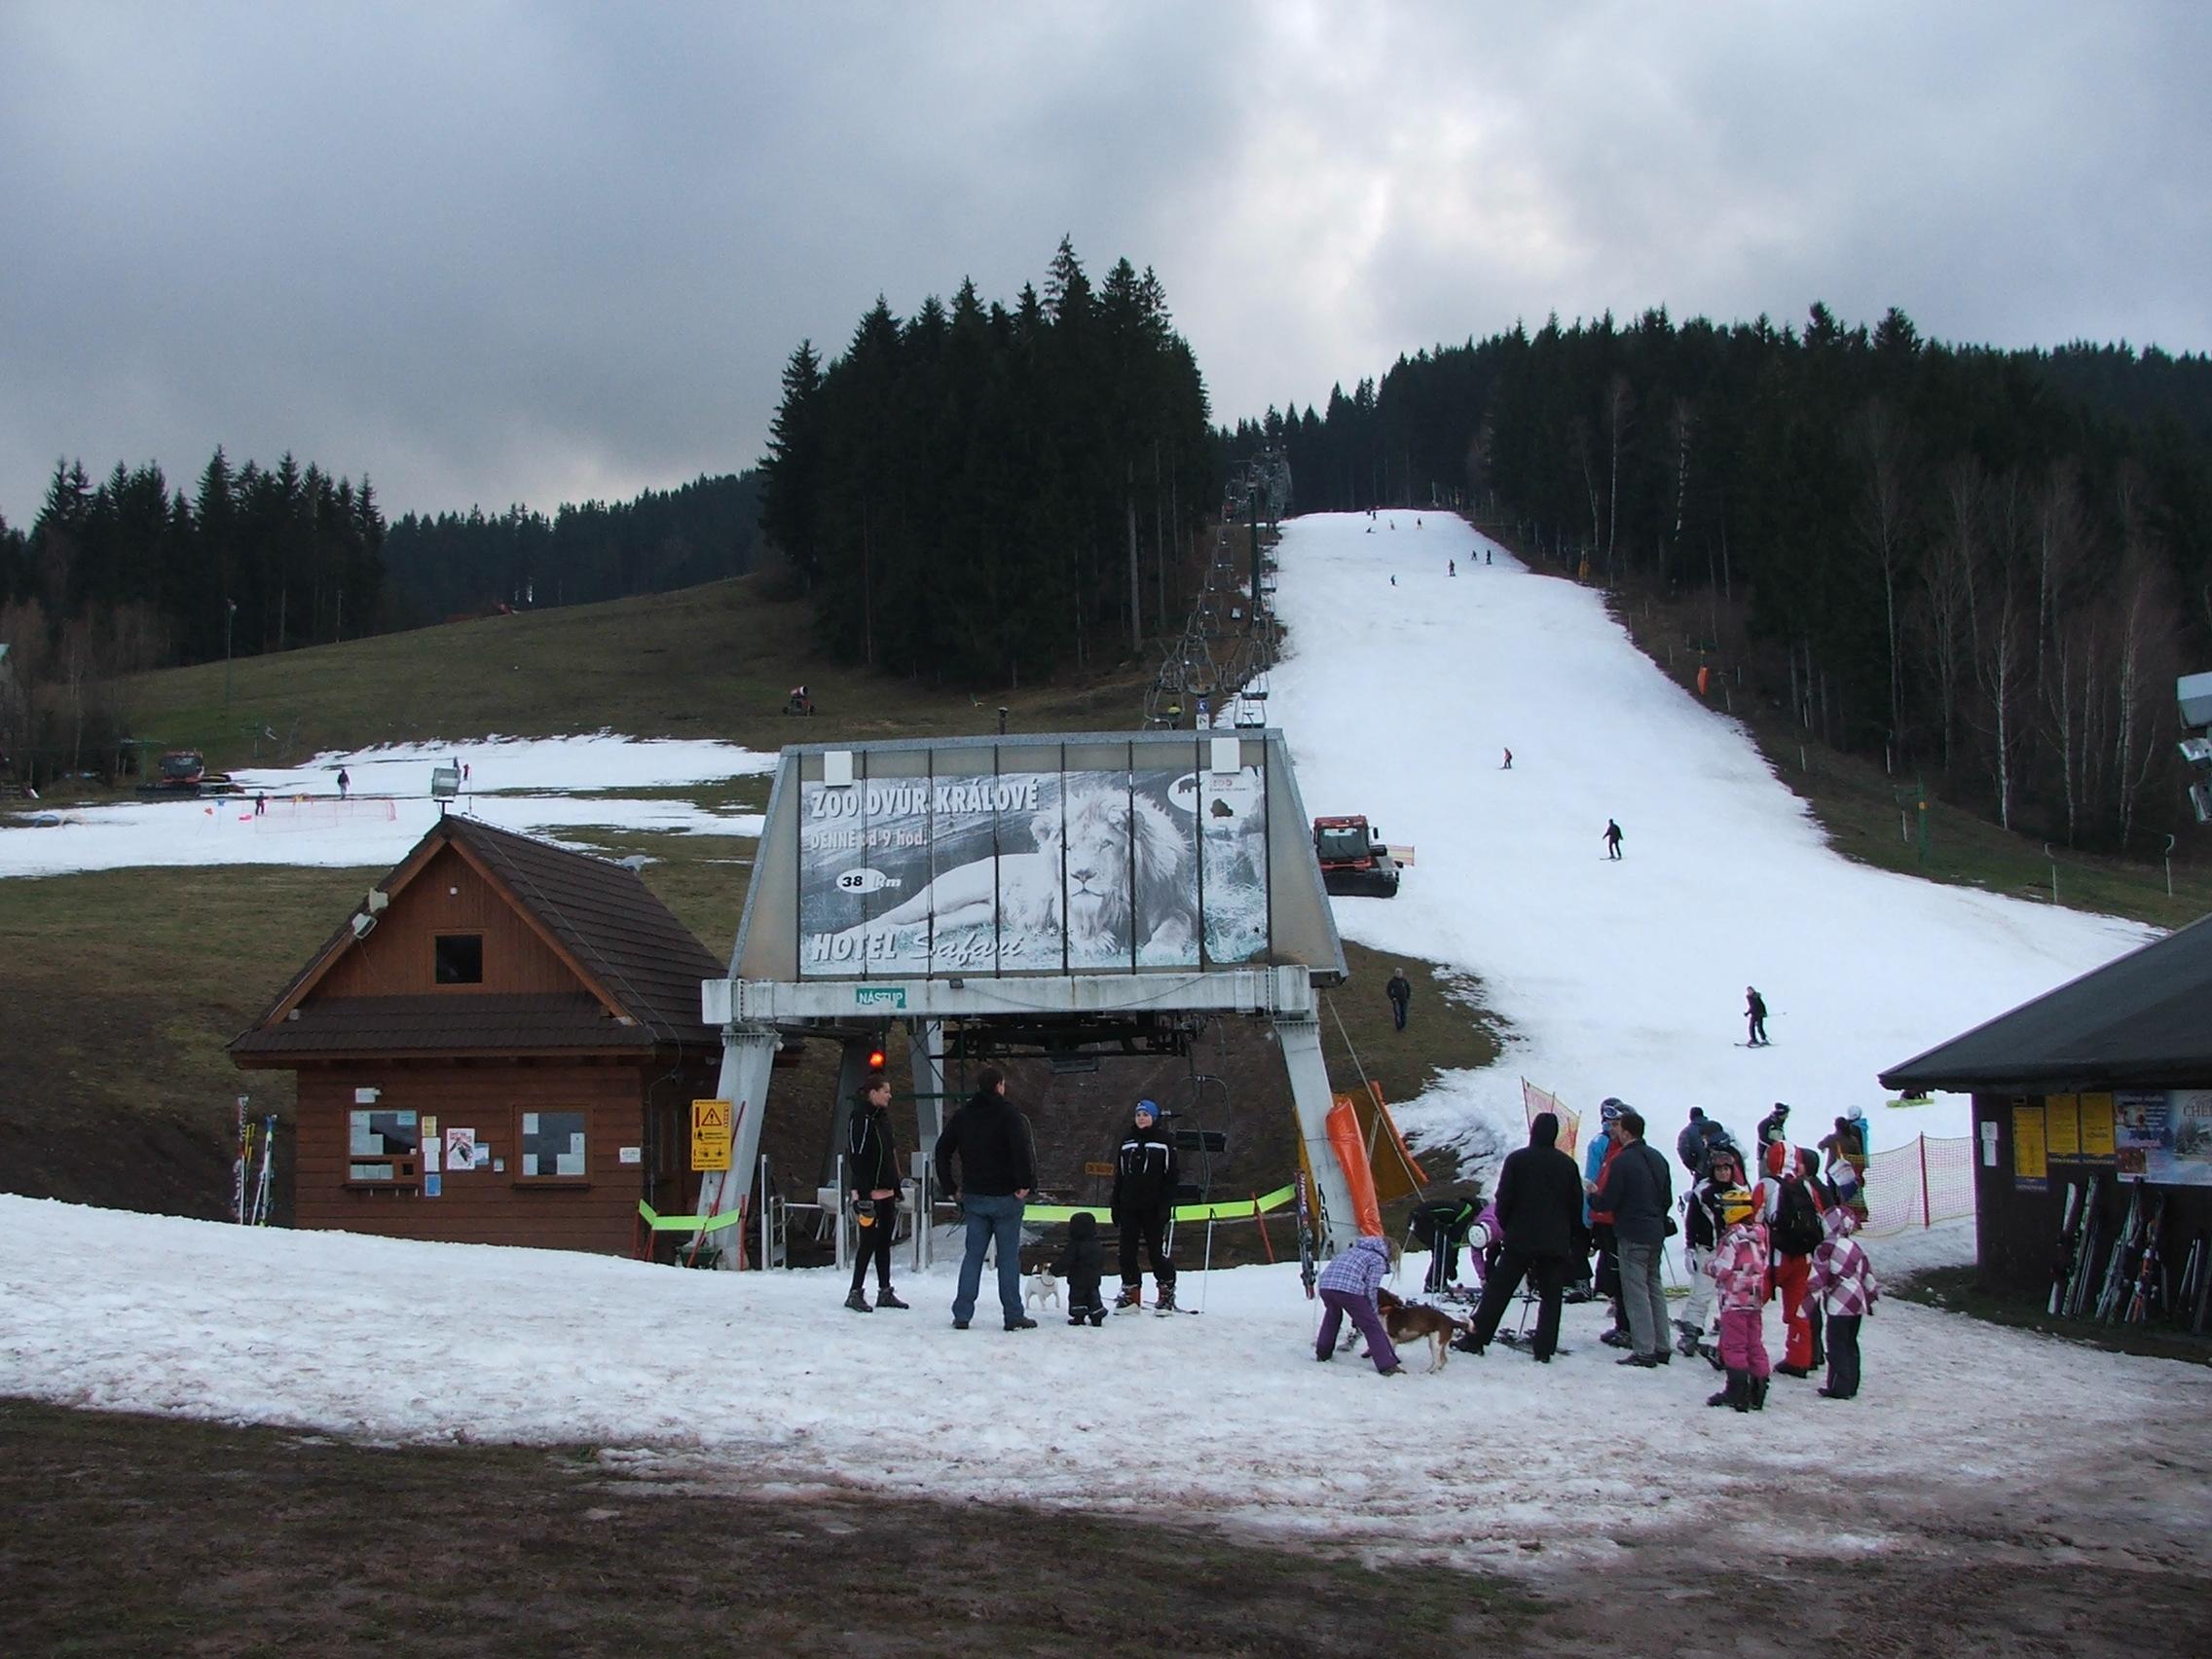 28.12.2013-Ski areál RALIŠKA,aktuální stav (7)